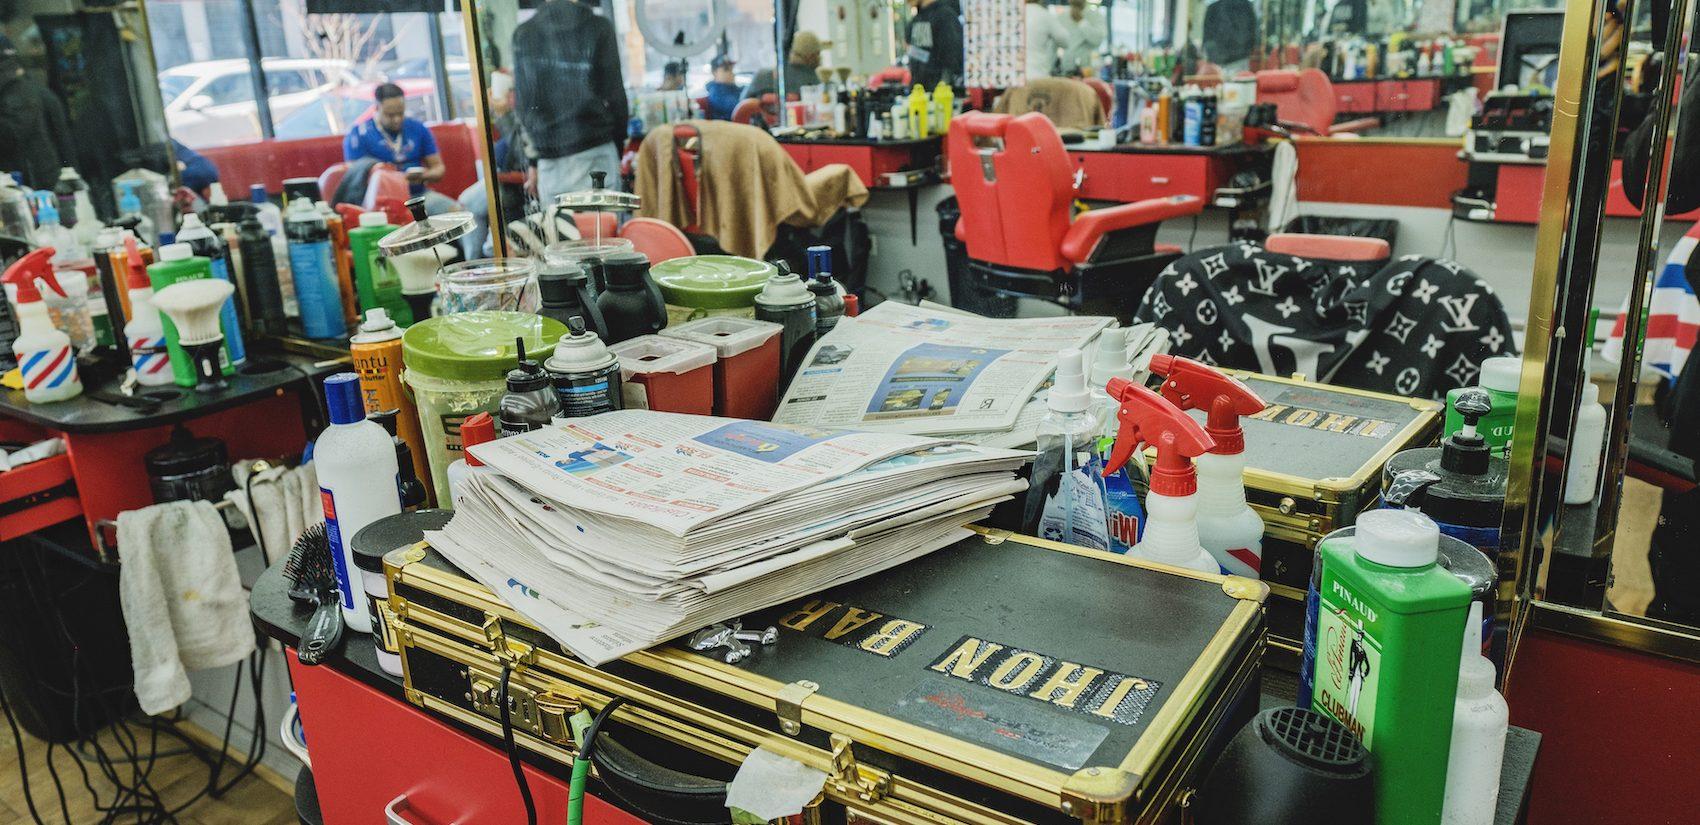 La Salsa Barber Shop serves the surrounding community on North Fifth Street, mostly Black and Latino Philadelphians from the area. | La mayoría de los clientes de La Salsa Barber Shop son latinos y afroamericanos del área local. (Photo by Bernardo Morillo/WHYY)